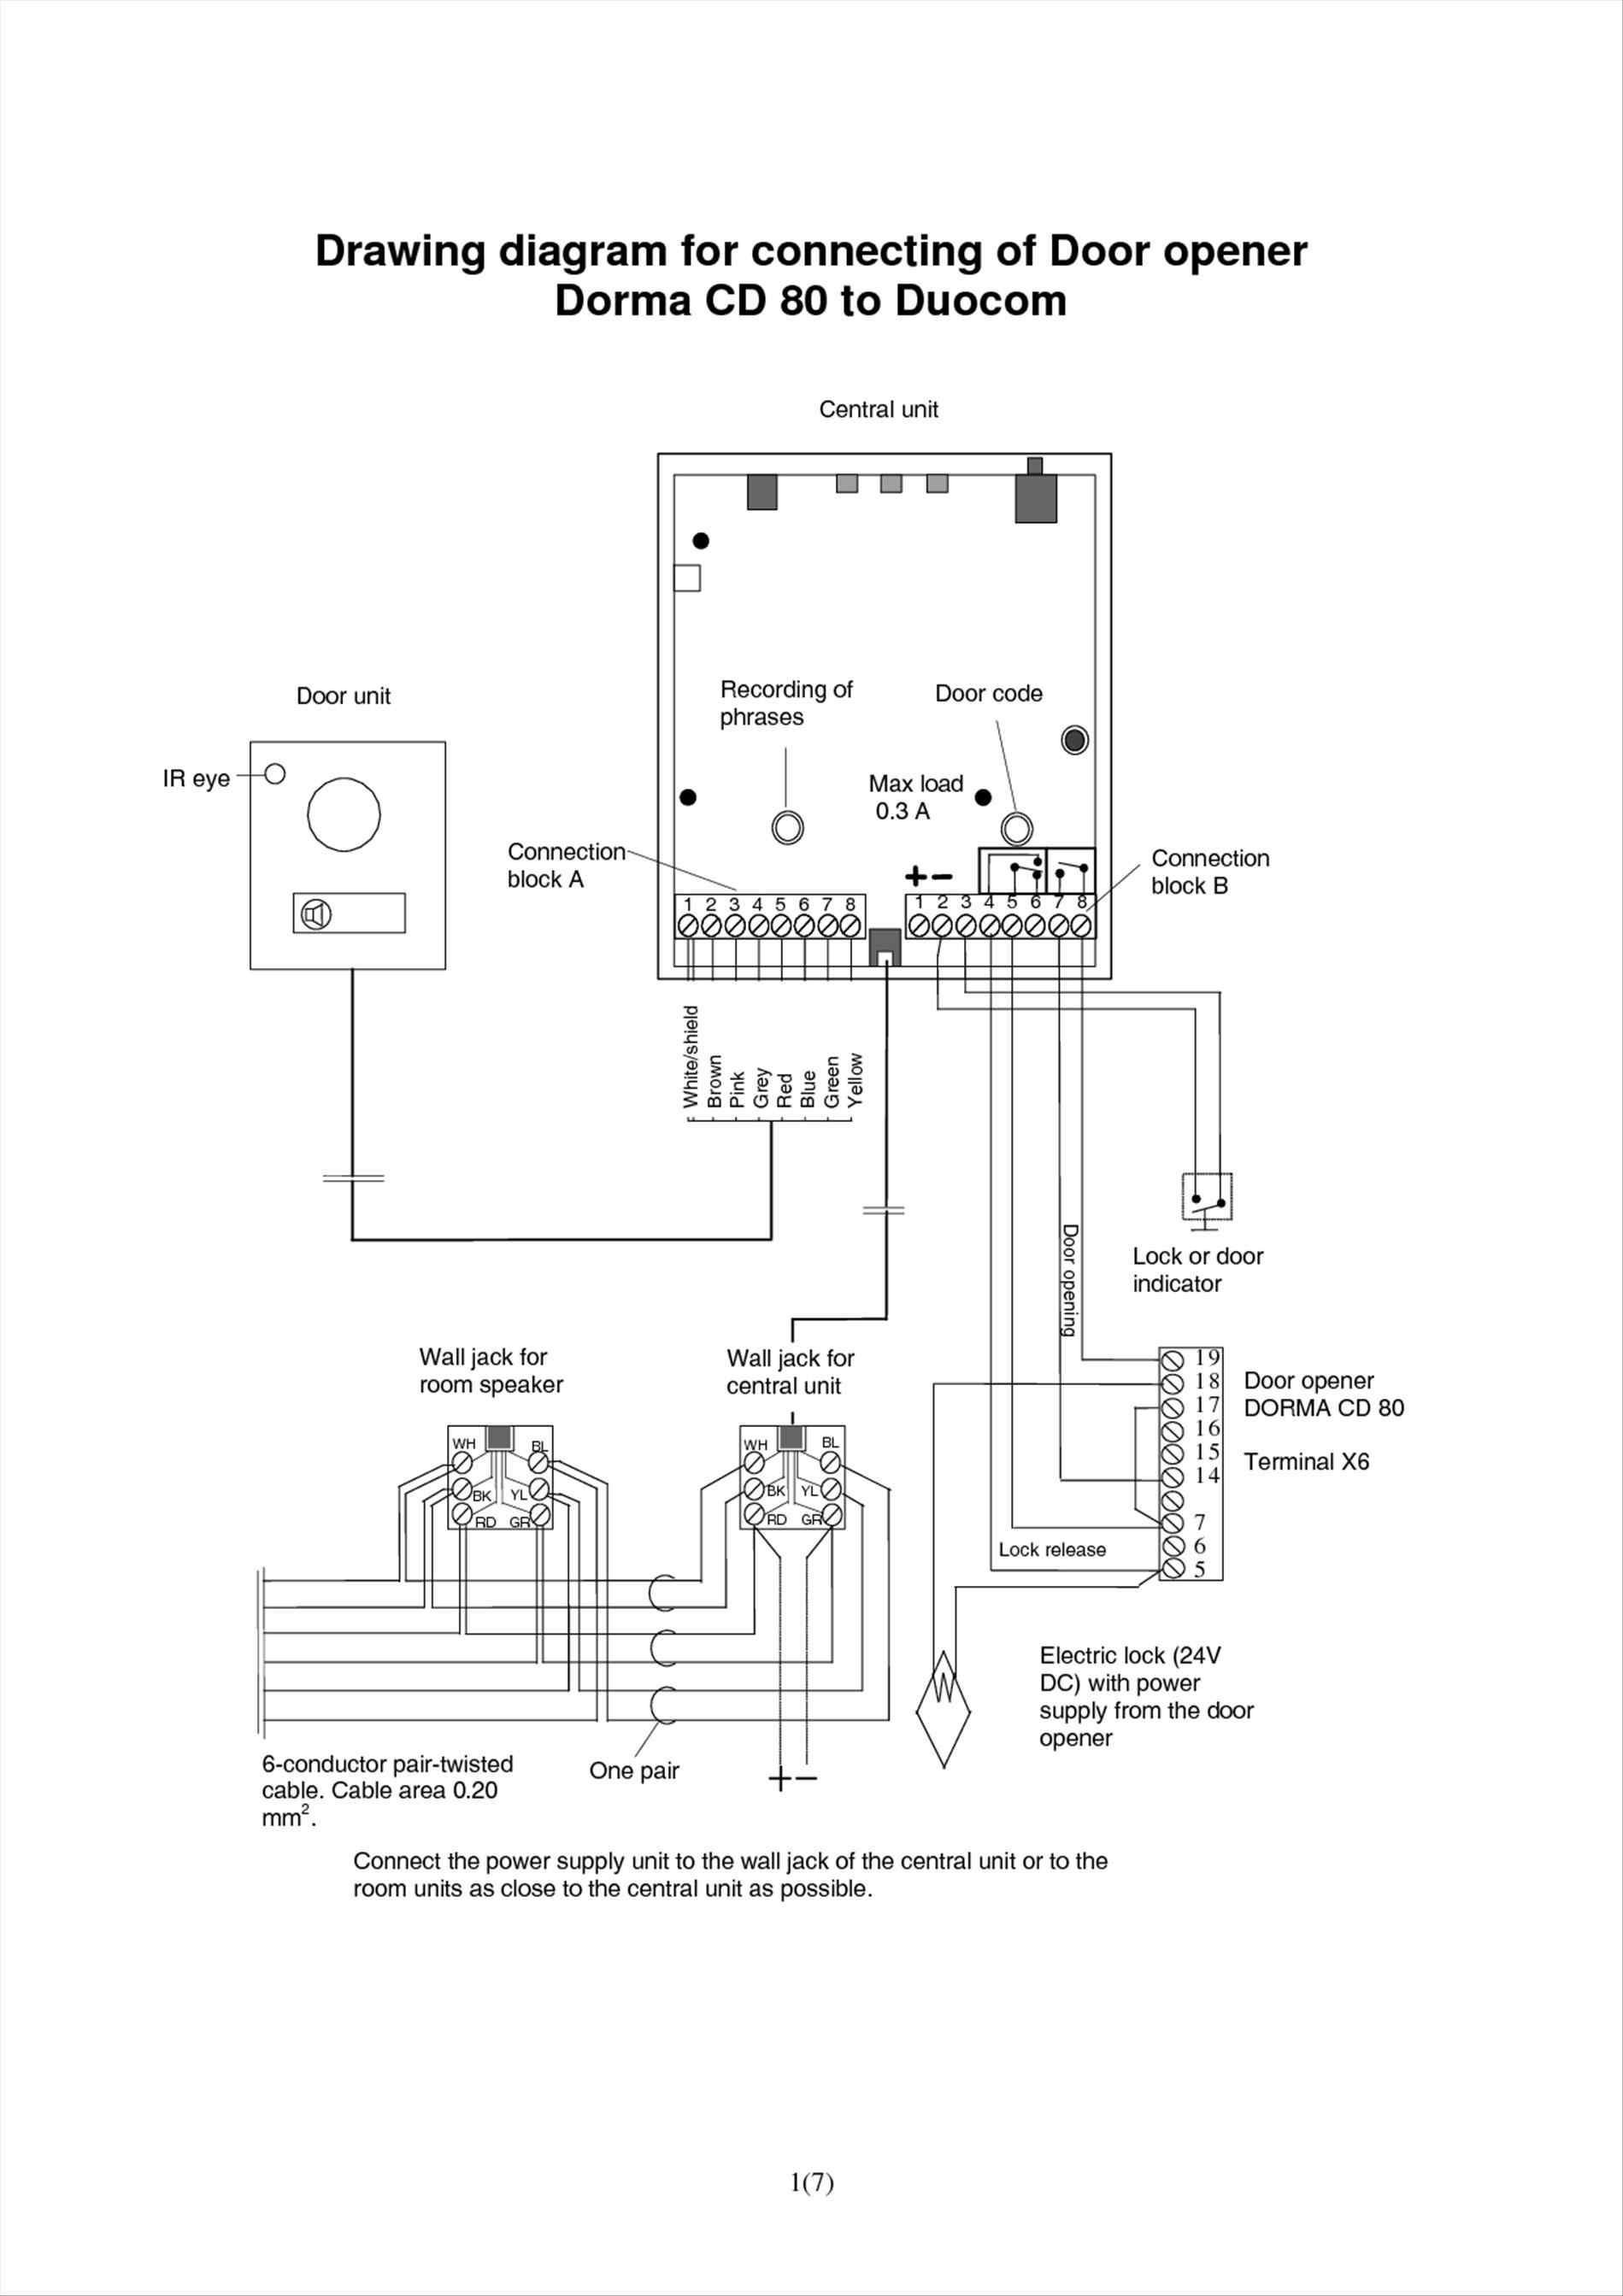 XV_4713] Wiring Chamberlain Garage Door Free Download Wiring Diagrams  Wiring DiagramPical Leona Icism Mecad Lious Verr Meric Scoba Mohammedshrine Librar Wiring  101